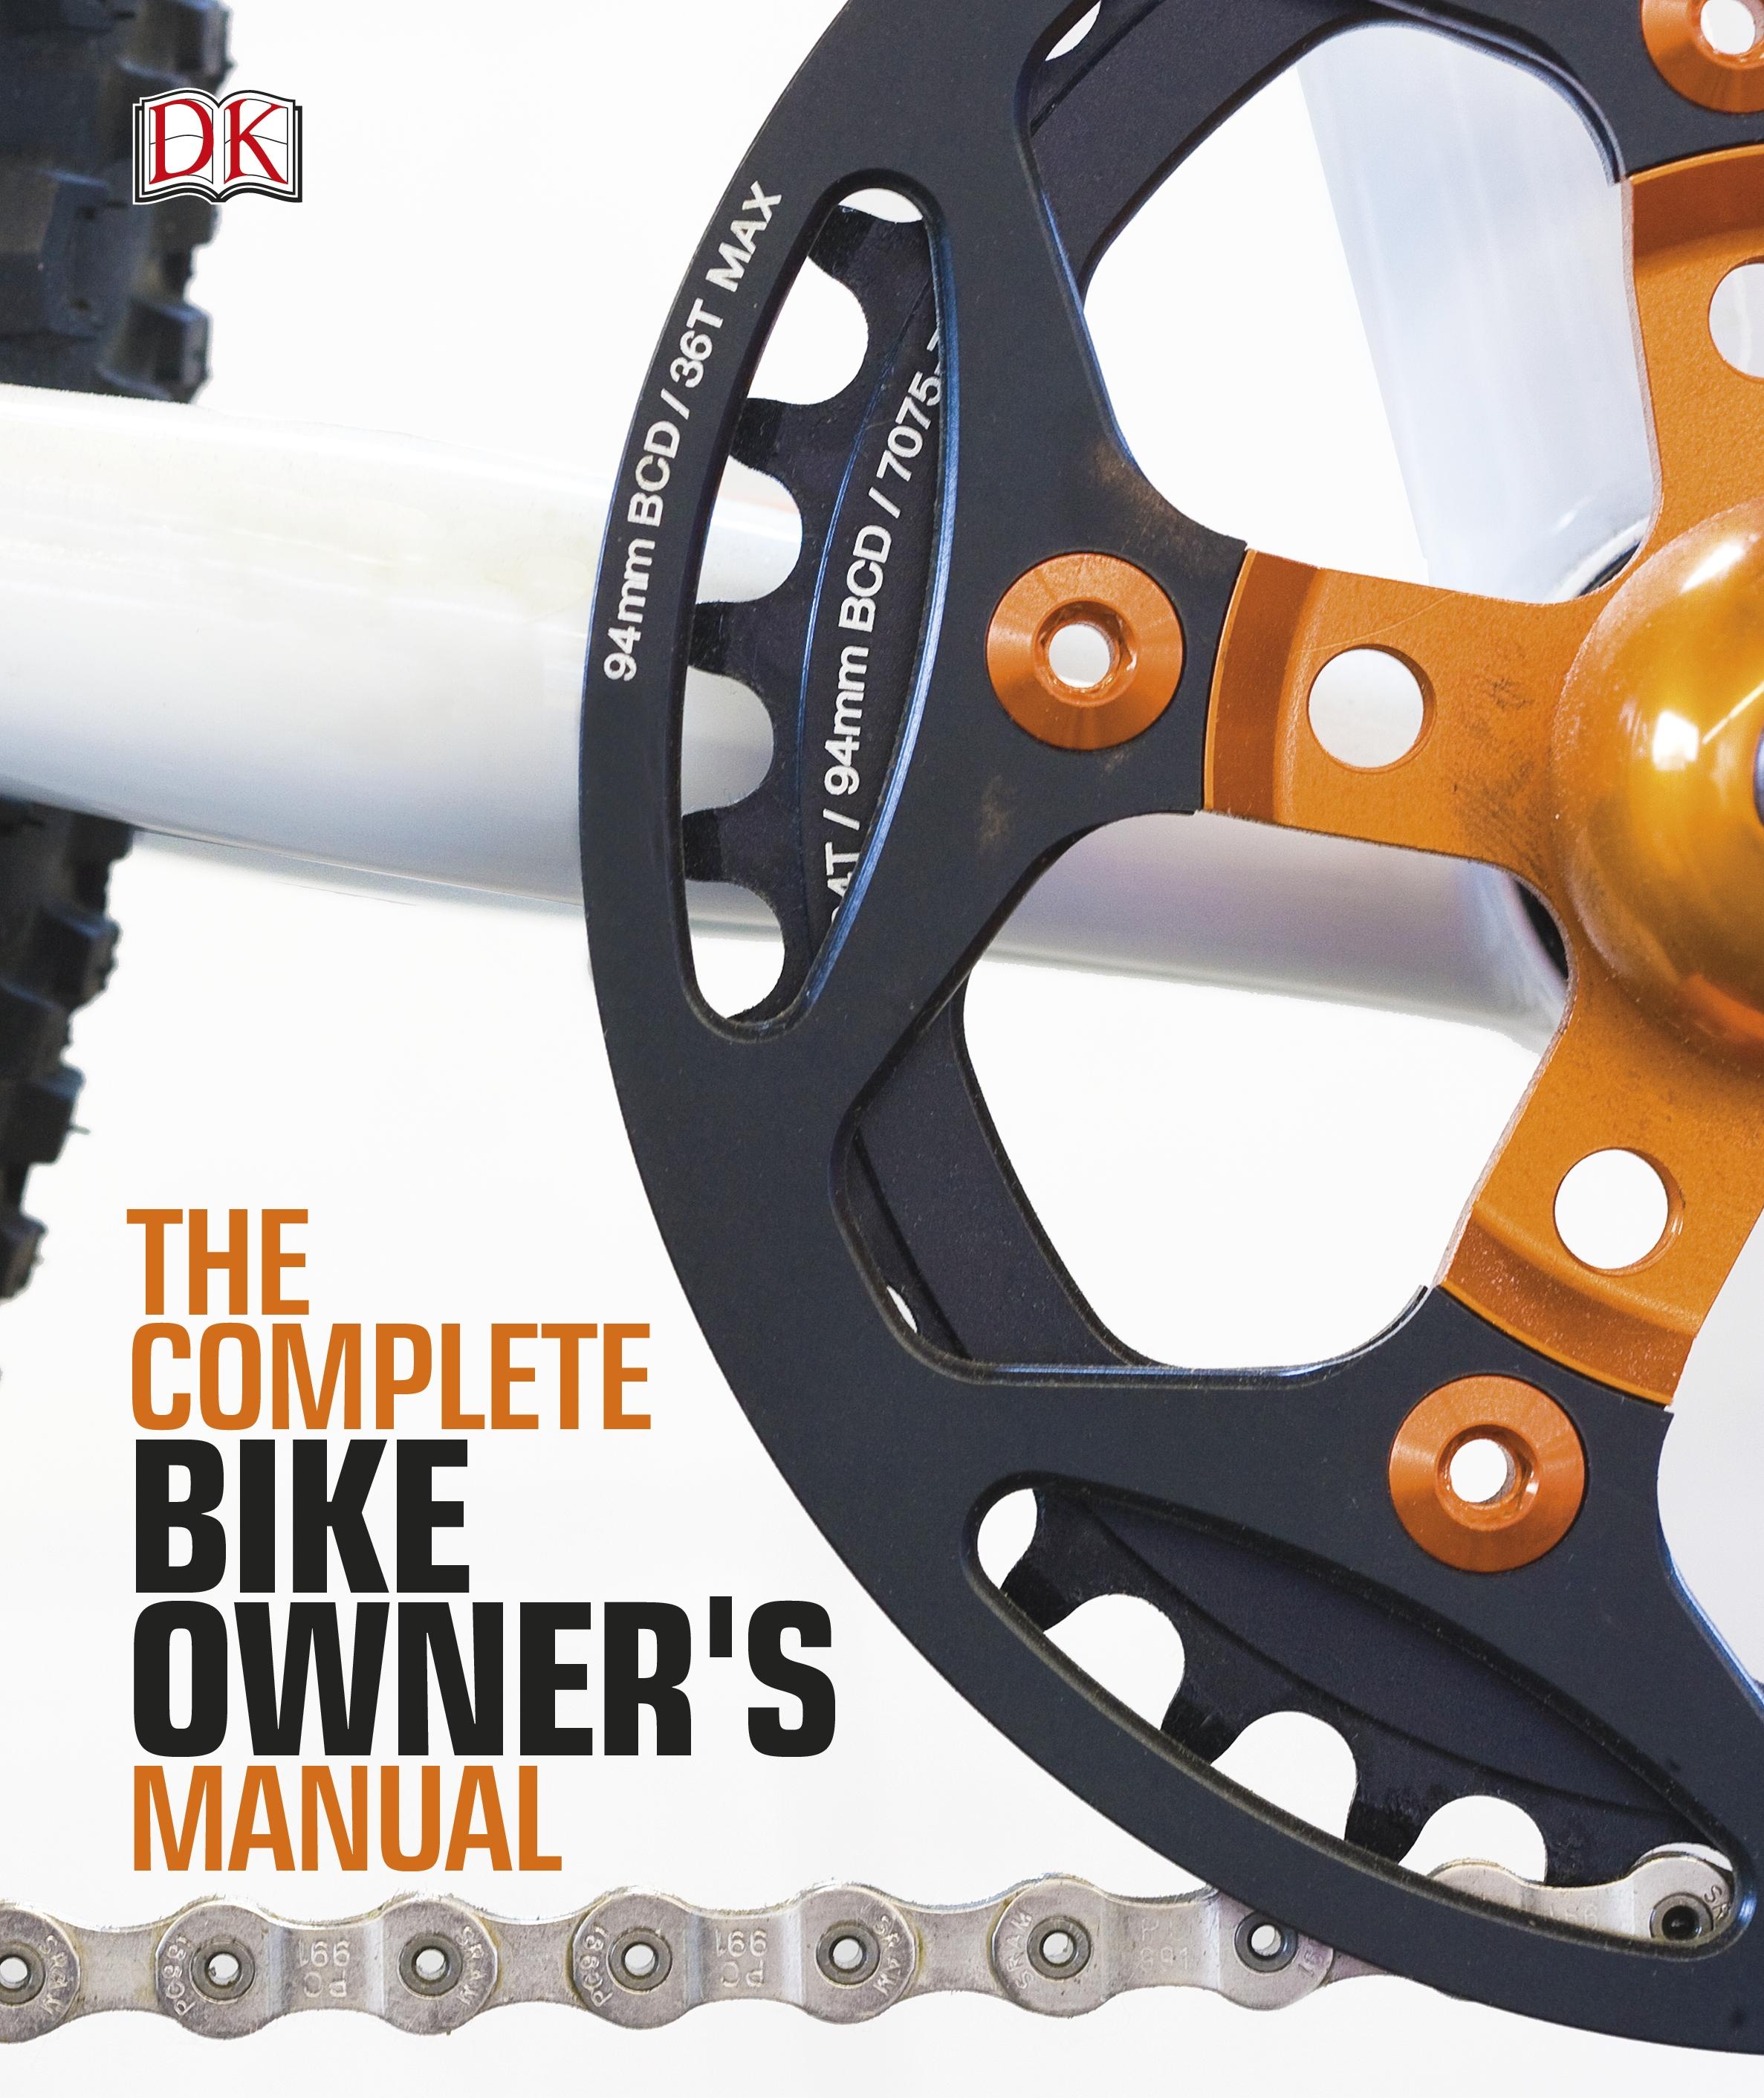 the complete bike owners manual by dk penguin books australia rh penguin com au schwinn 270 recumbent bike owner's manual exercise bike owner's manuals